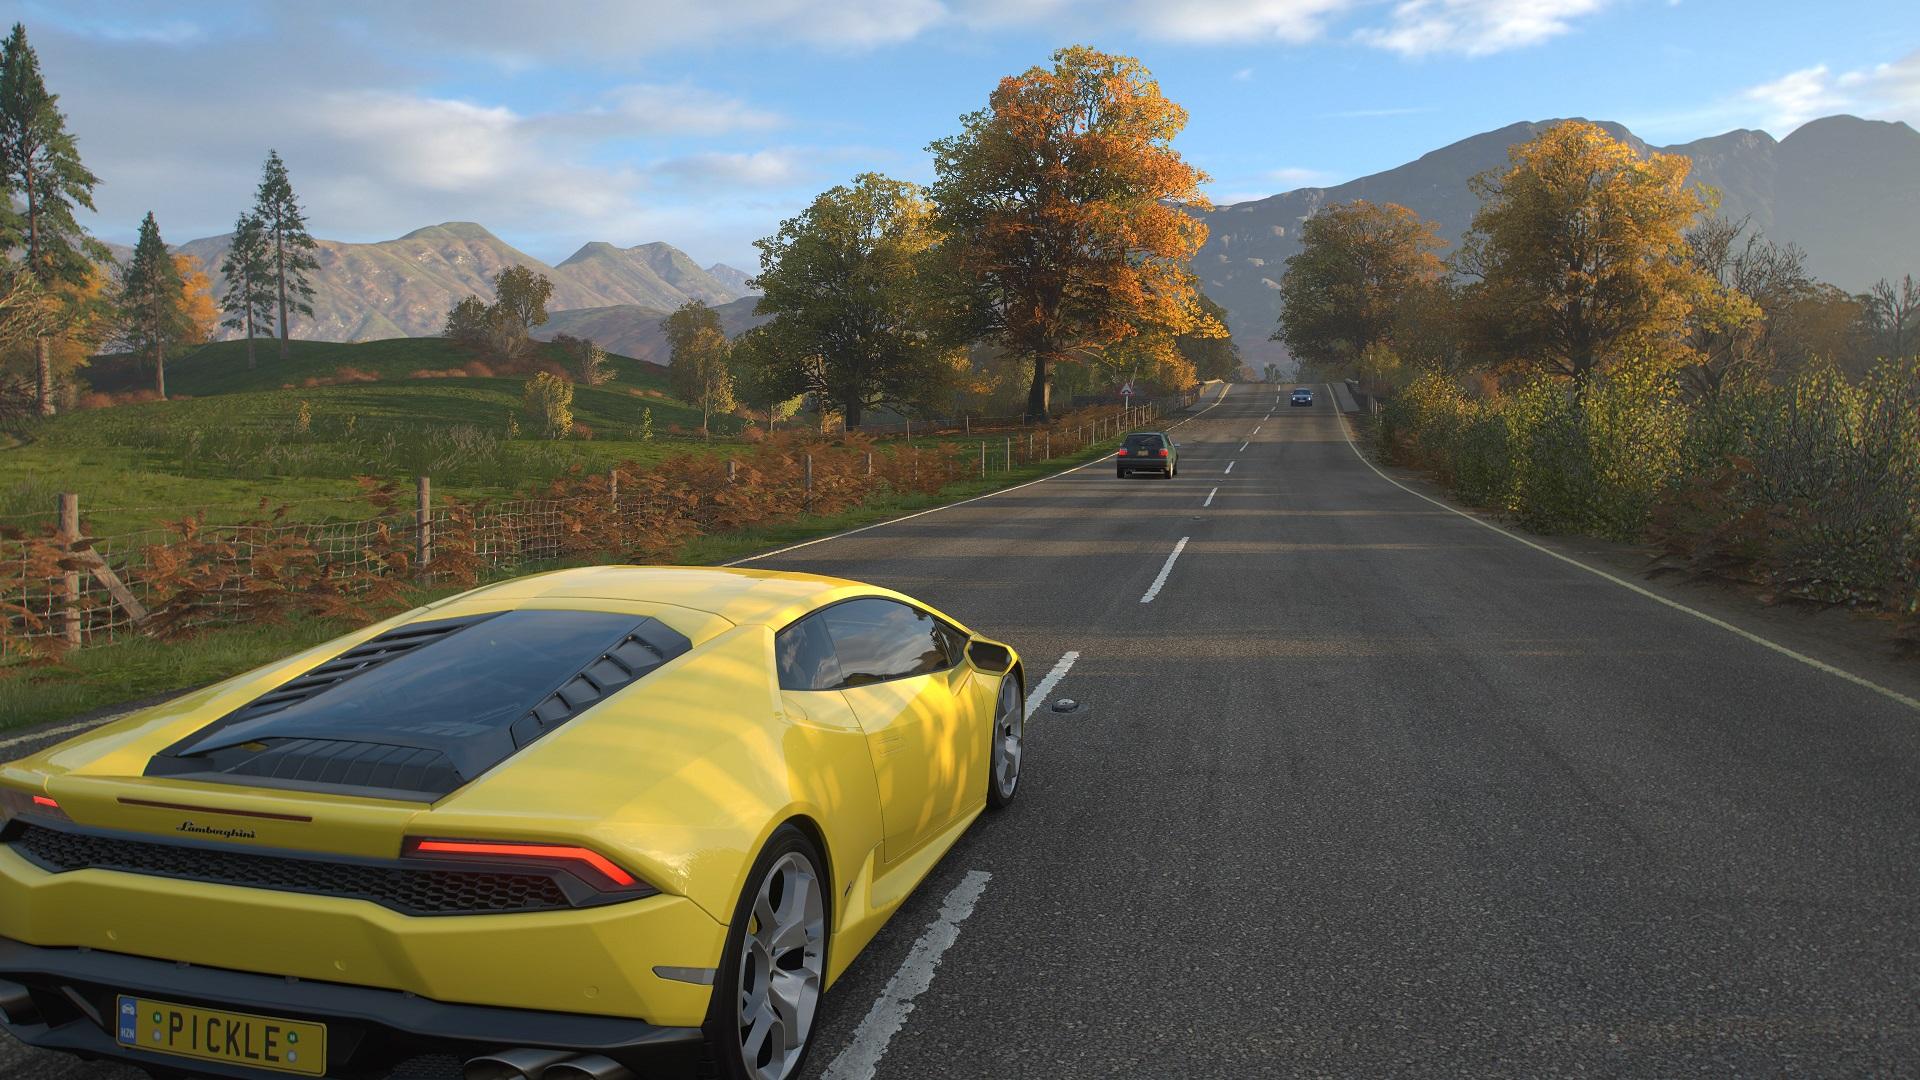 Forza-Horizon-, Xbox Series X, Review, GamersRD